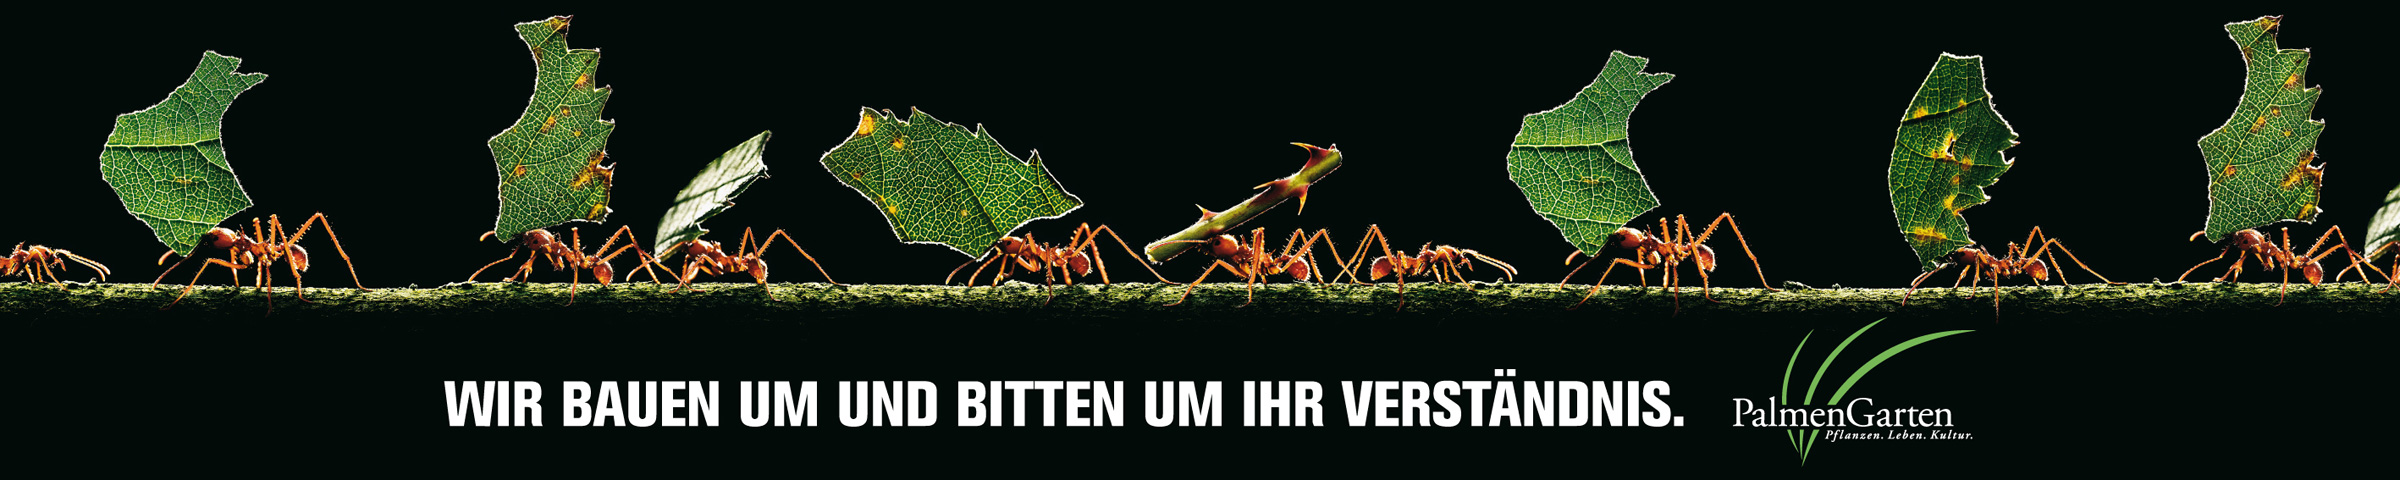 fallbeispiel-palmengarten_bauzaun_2400px